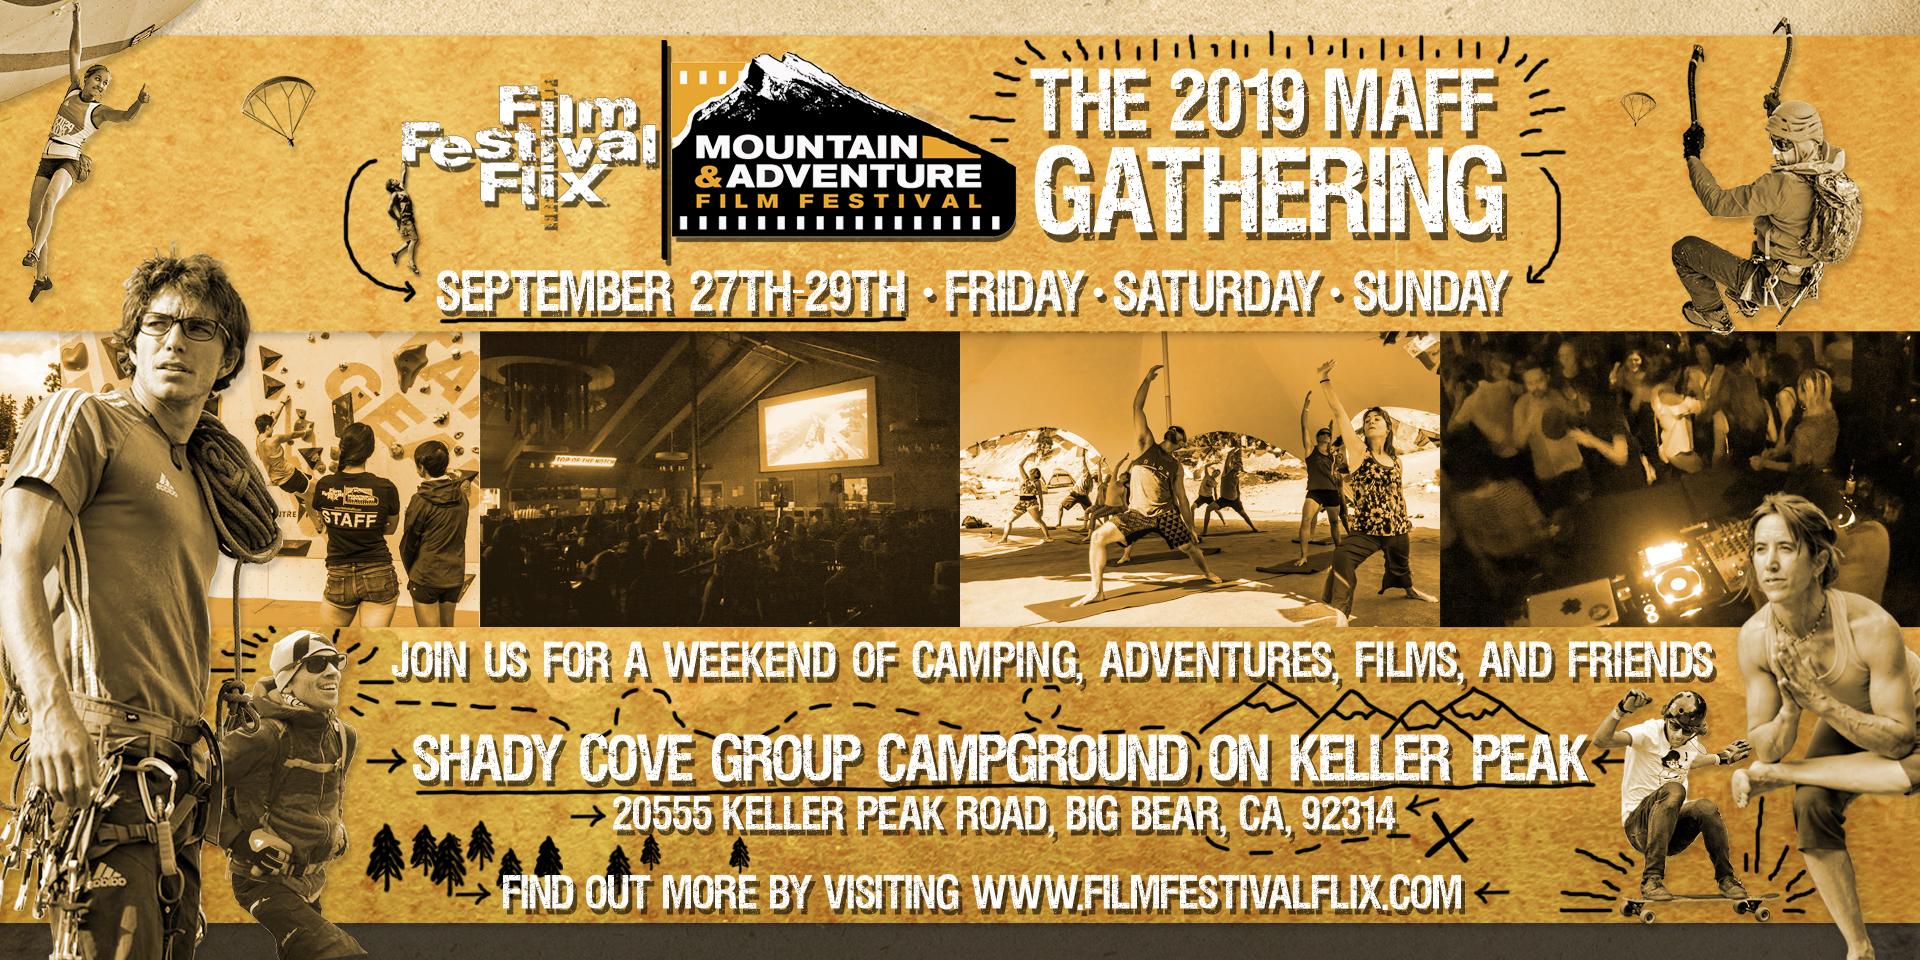 2019 MAFF Gathering